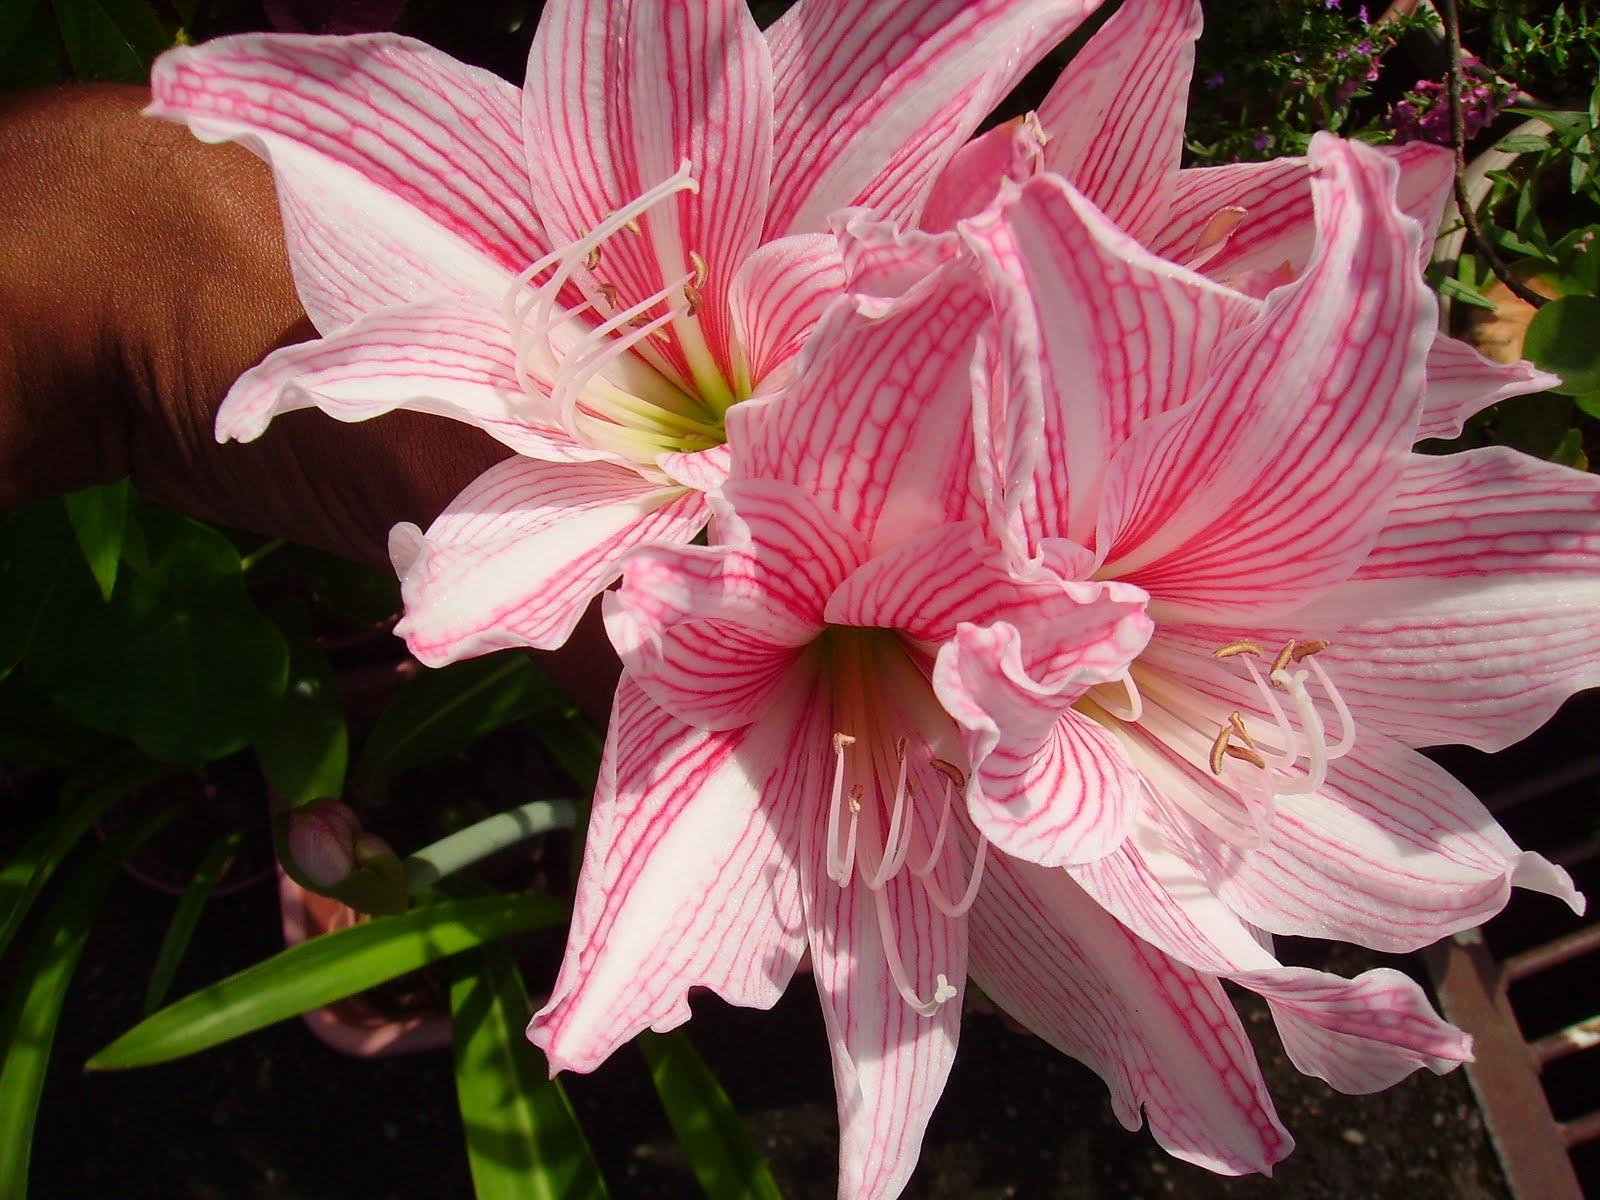 Garden Chronicles: Amaryllis Bloom